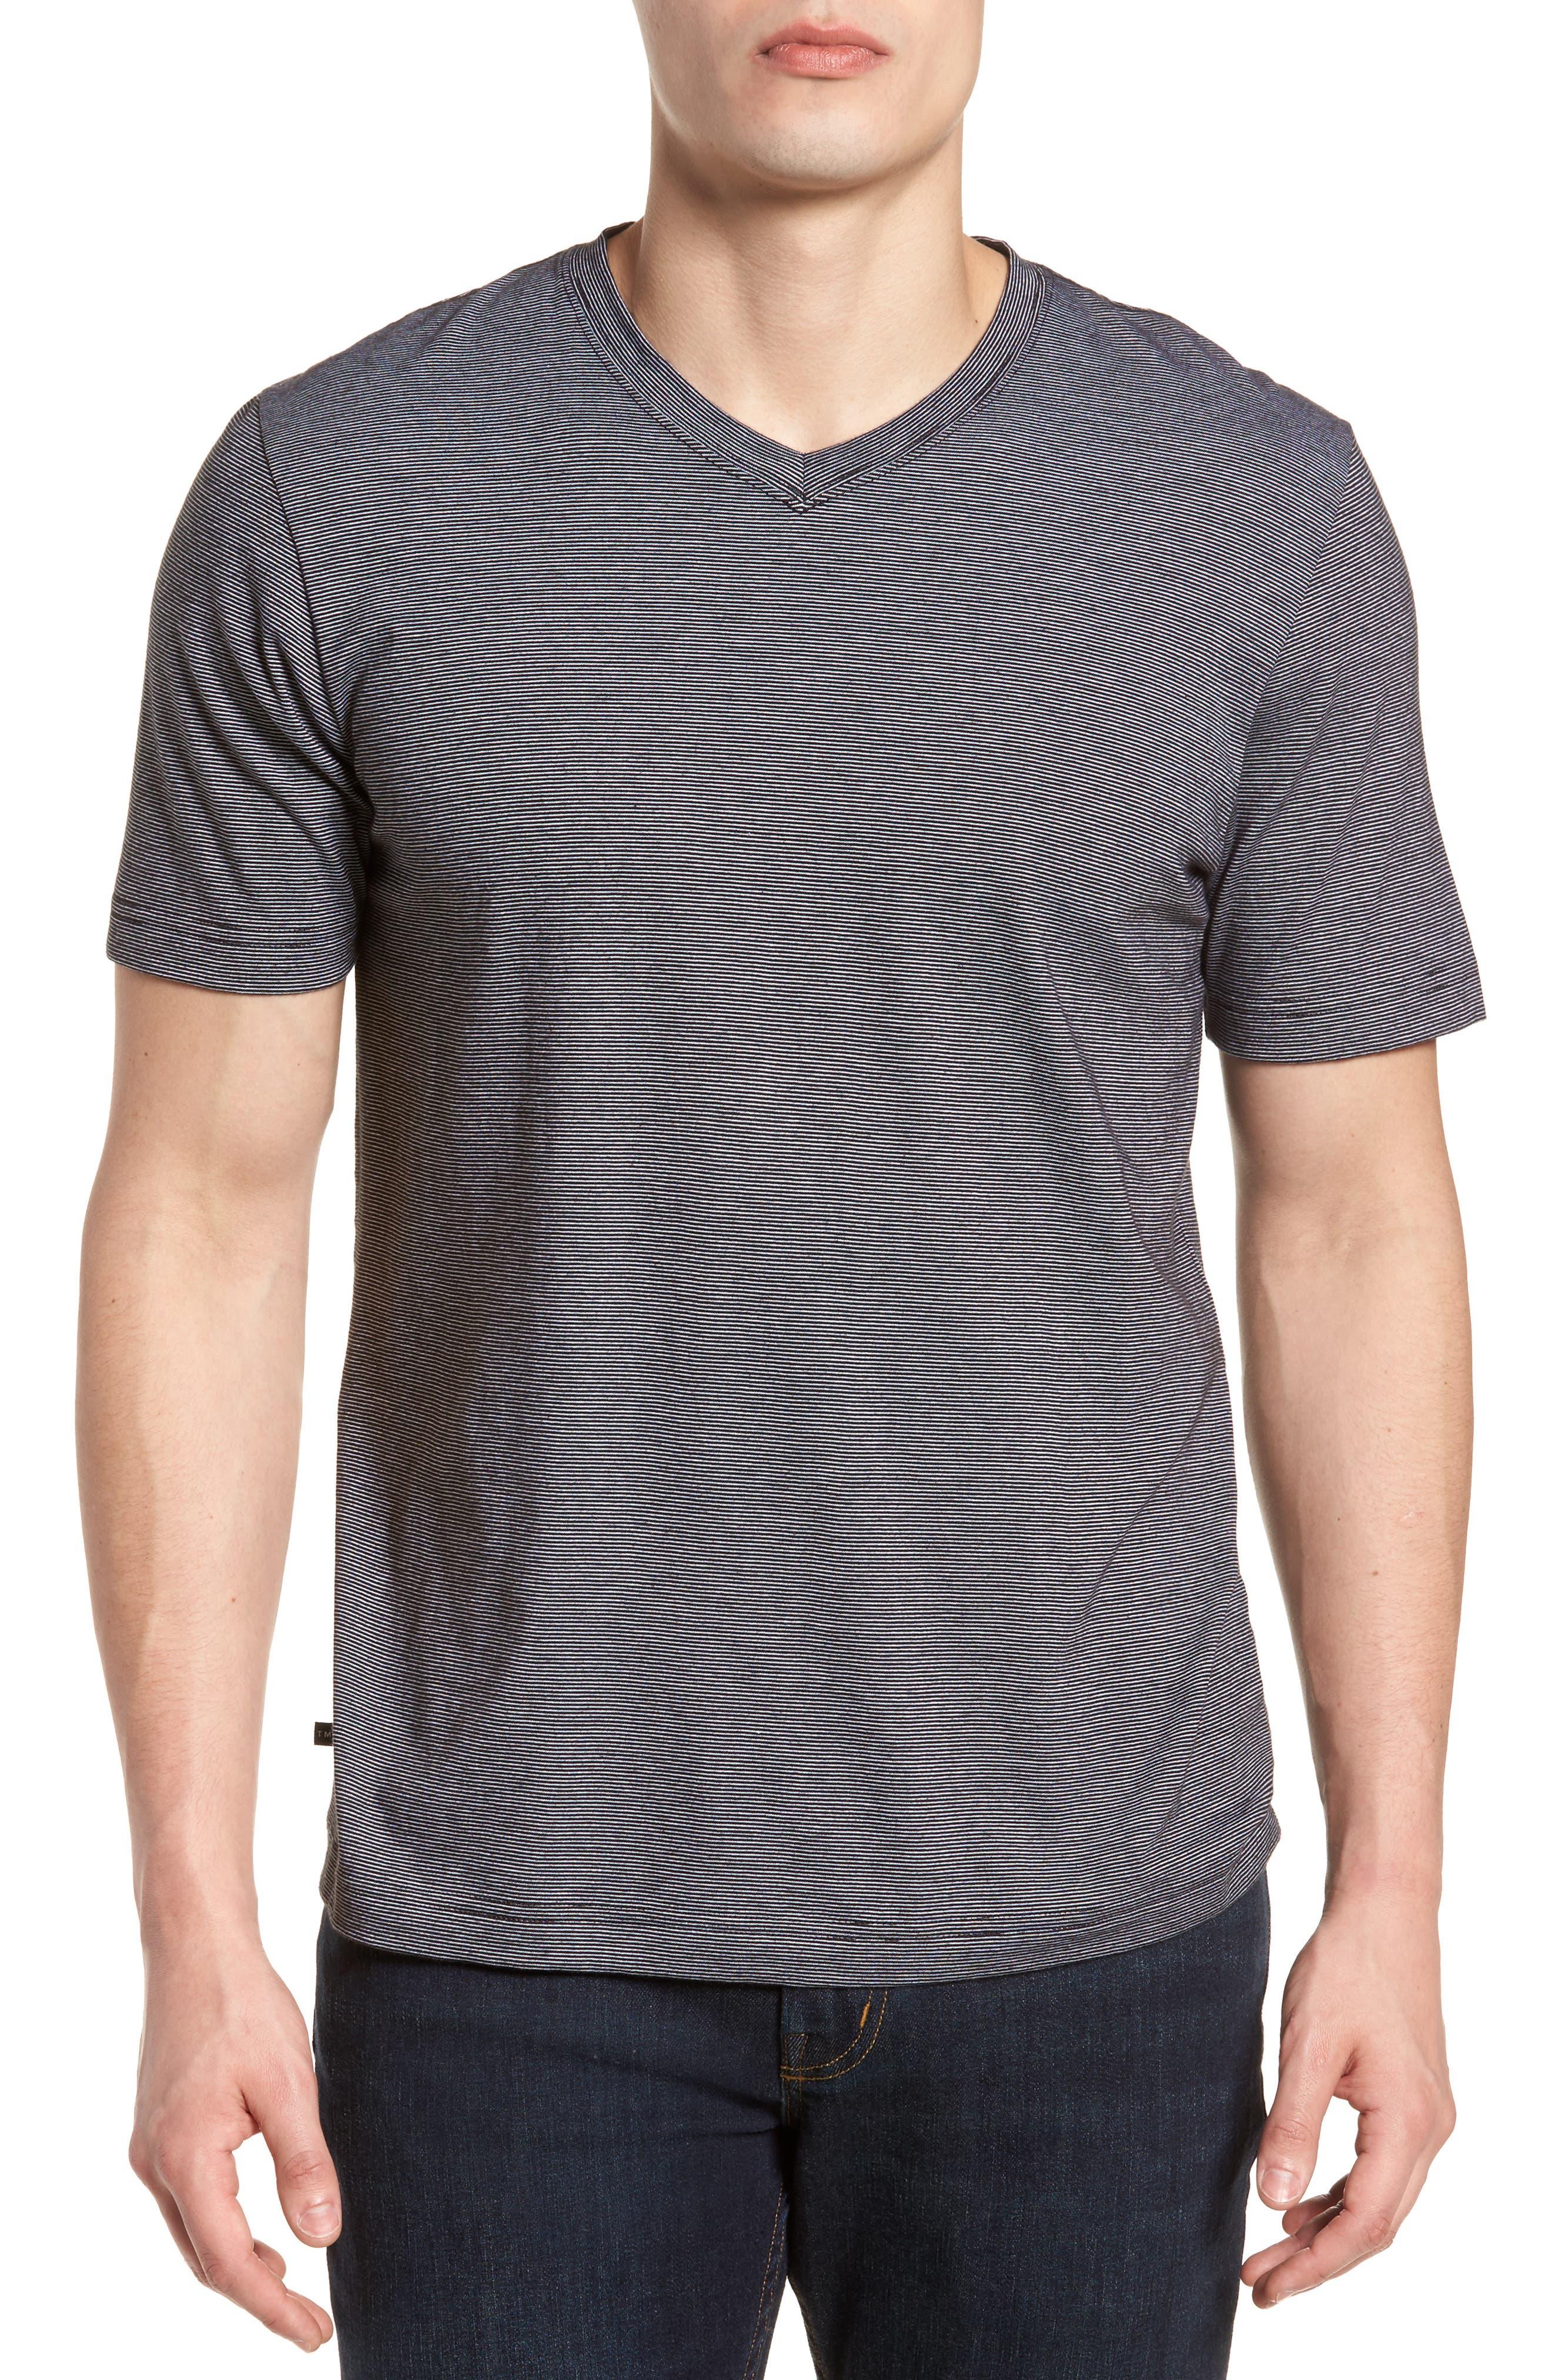 El Presidente T-Shirt,                         Main,                         color, Black/ White